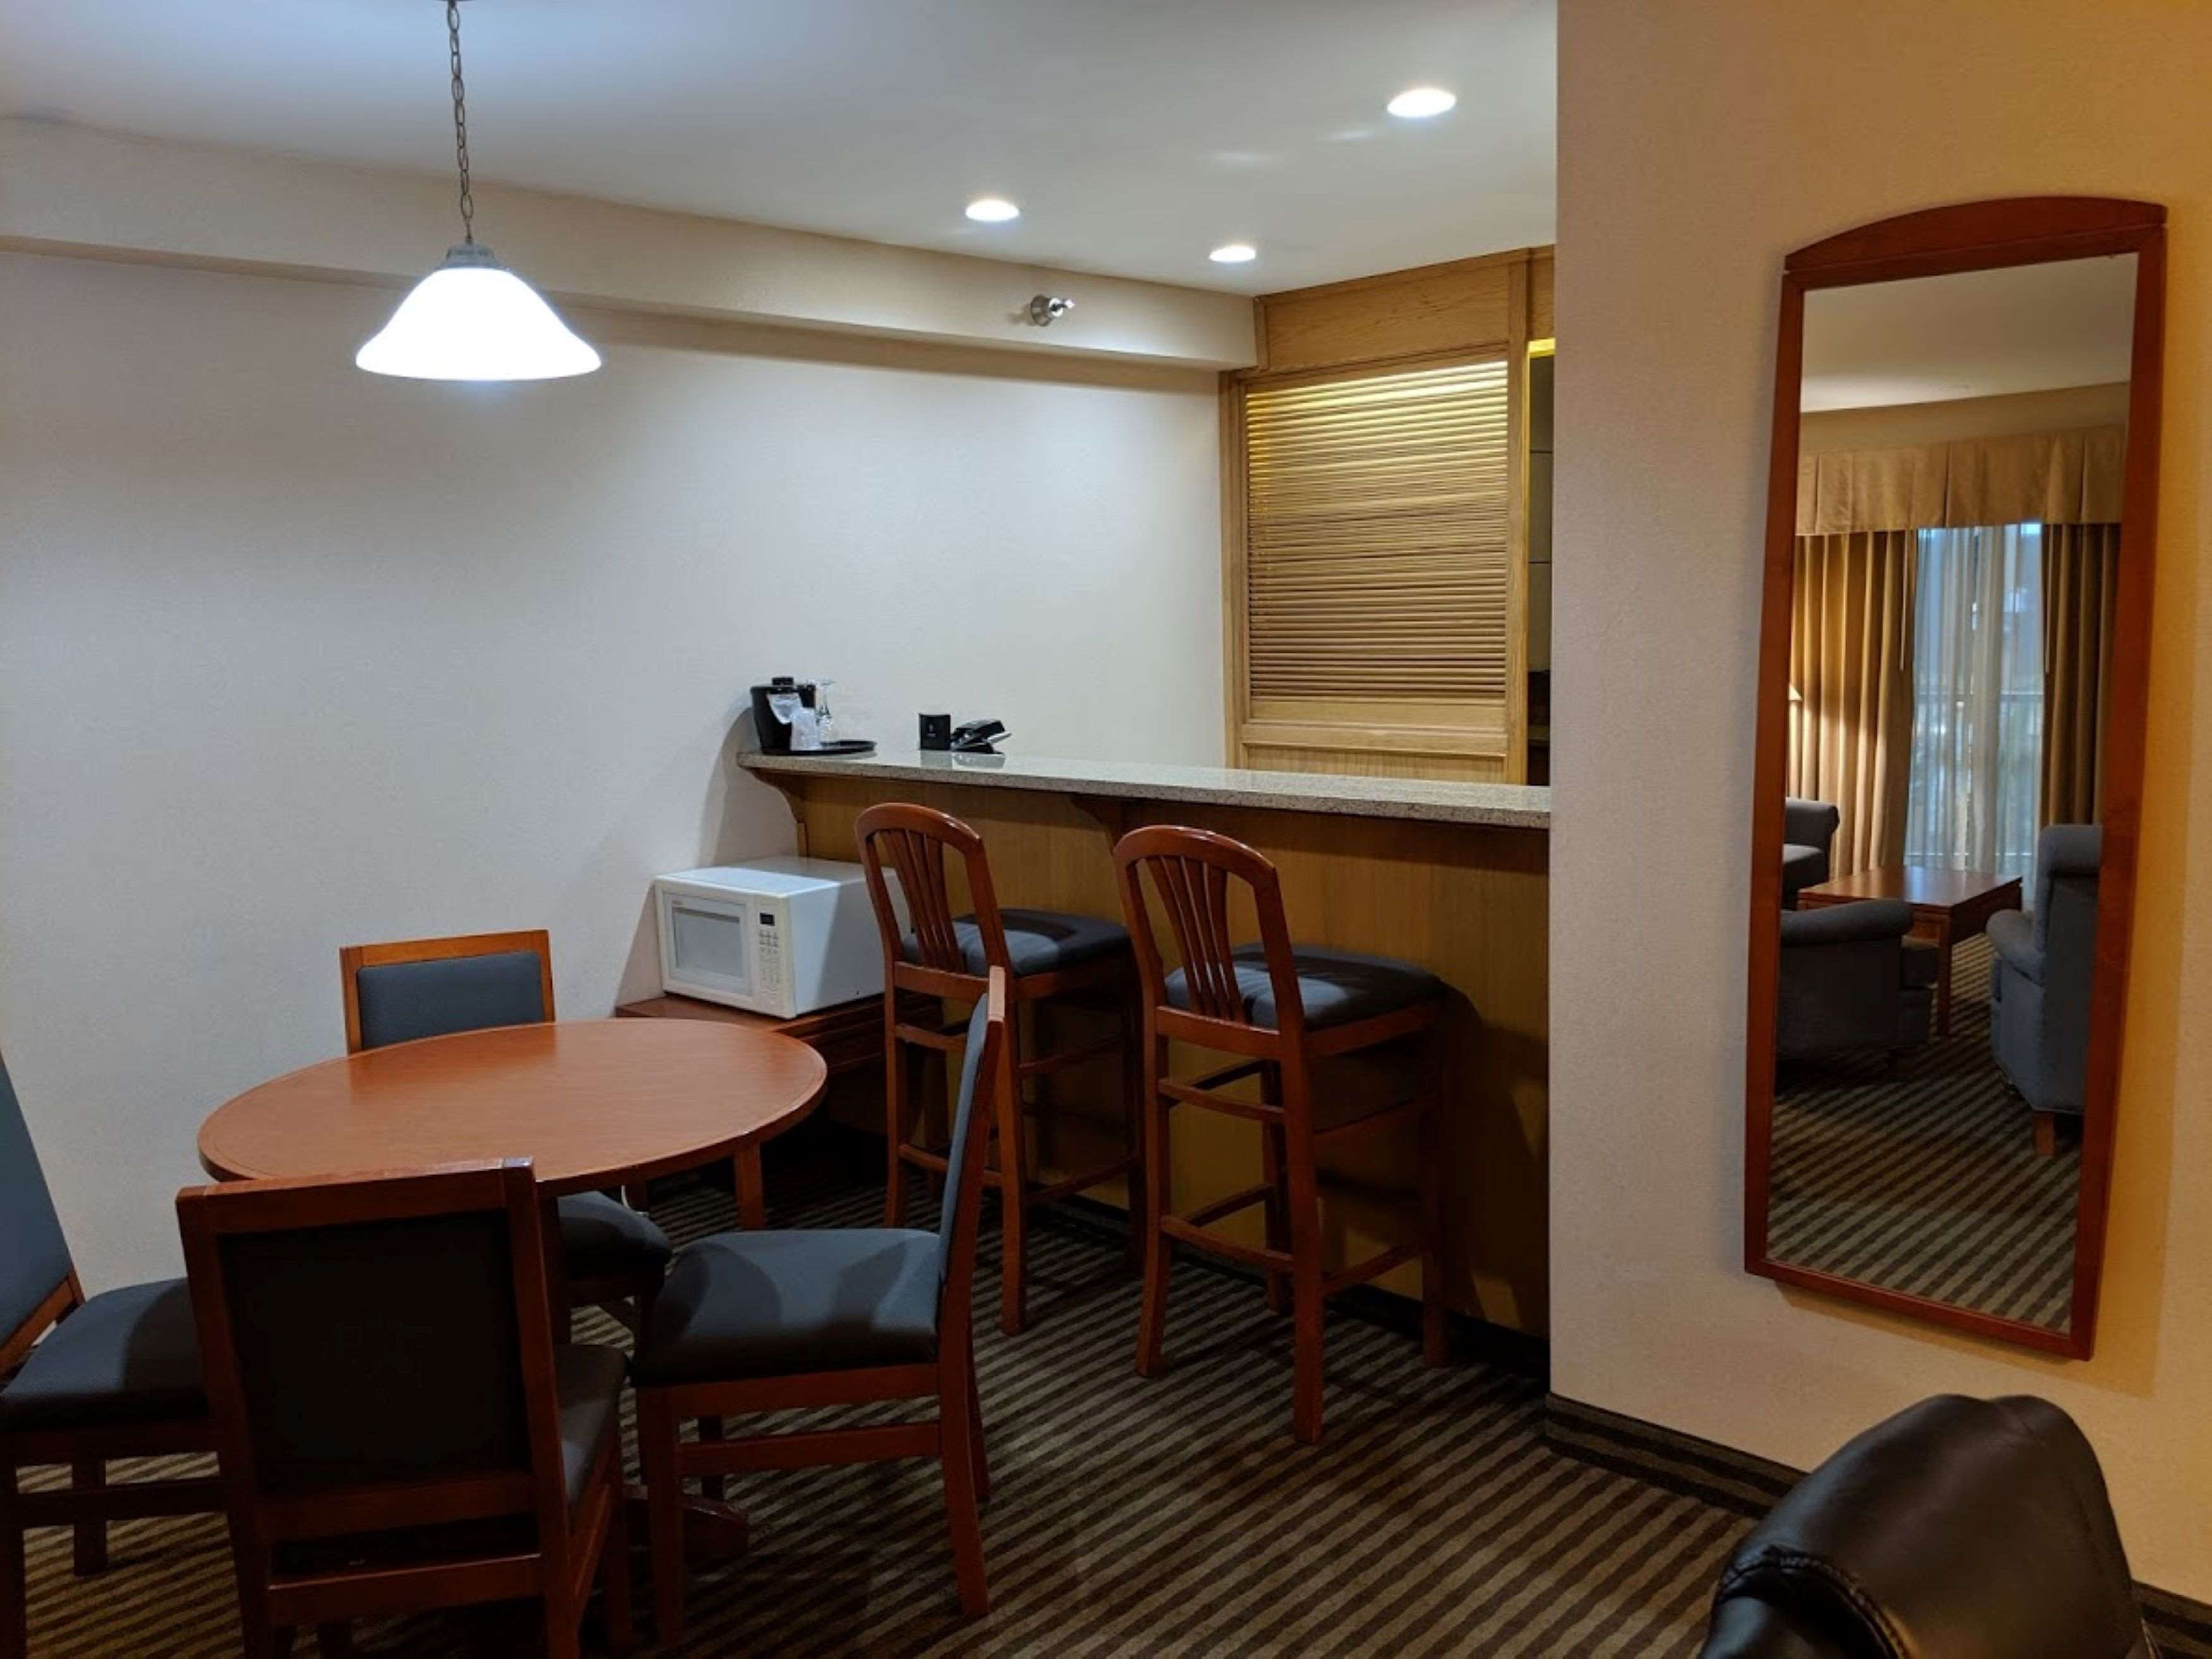 Surestay Hotel By Best Western Chilliwack in Chilliwack: King Suite Atrium Dining Room